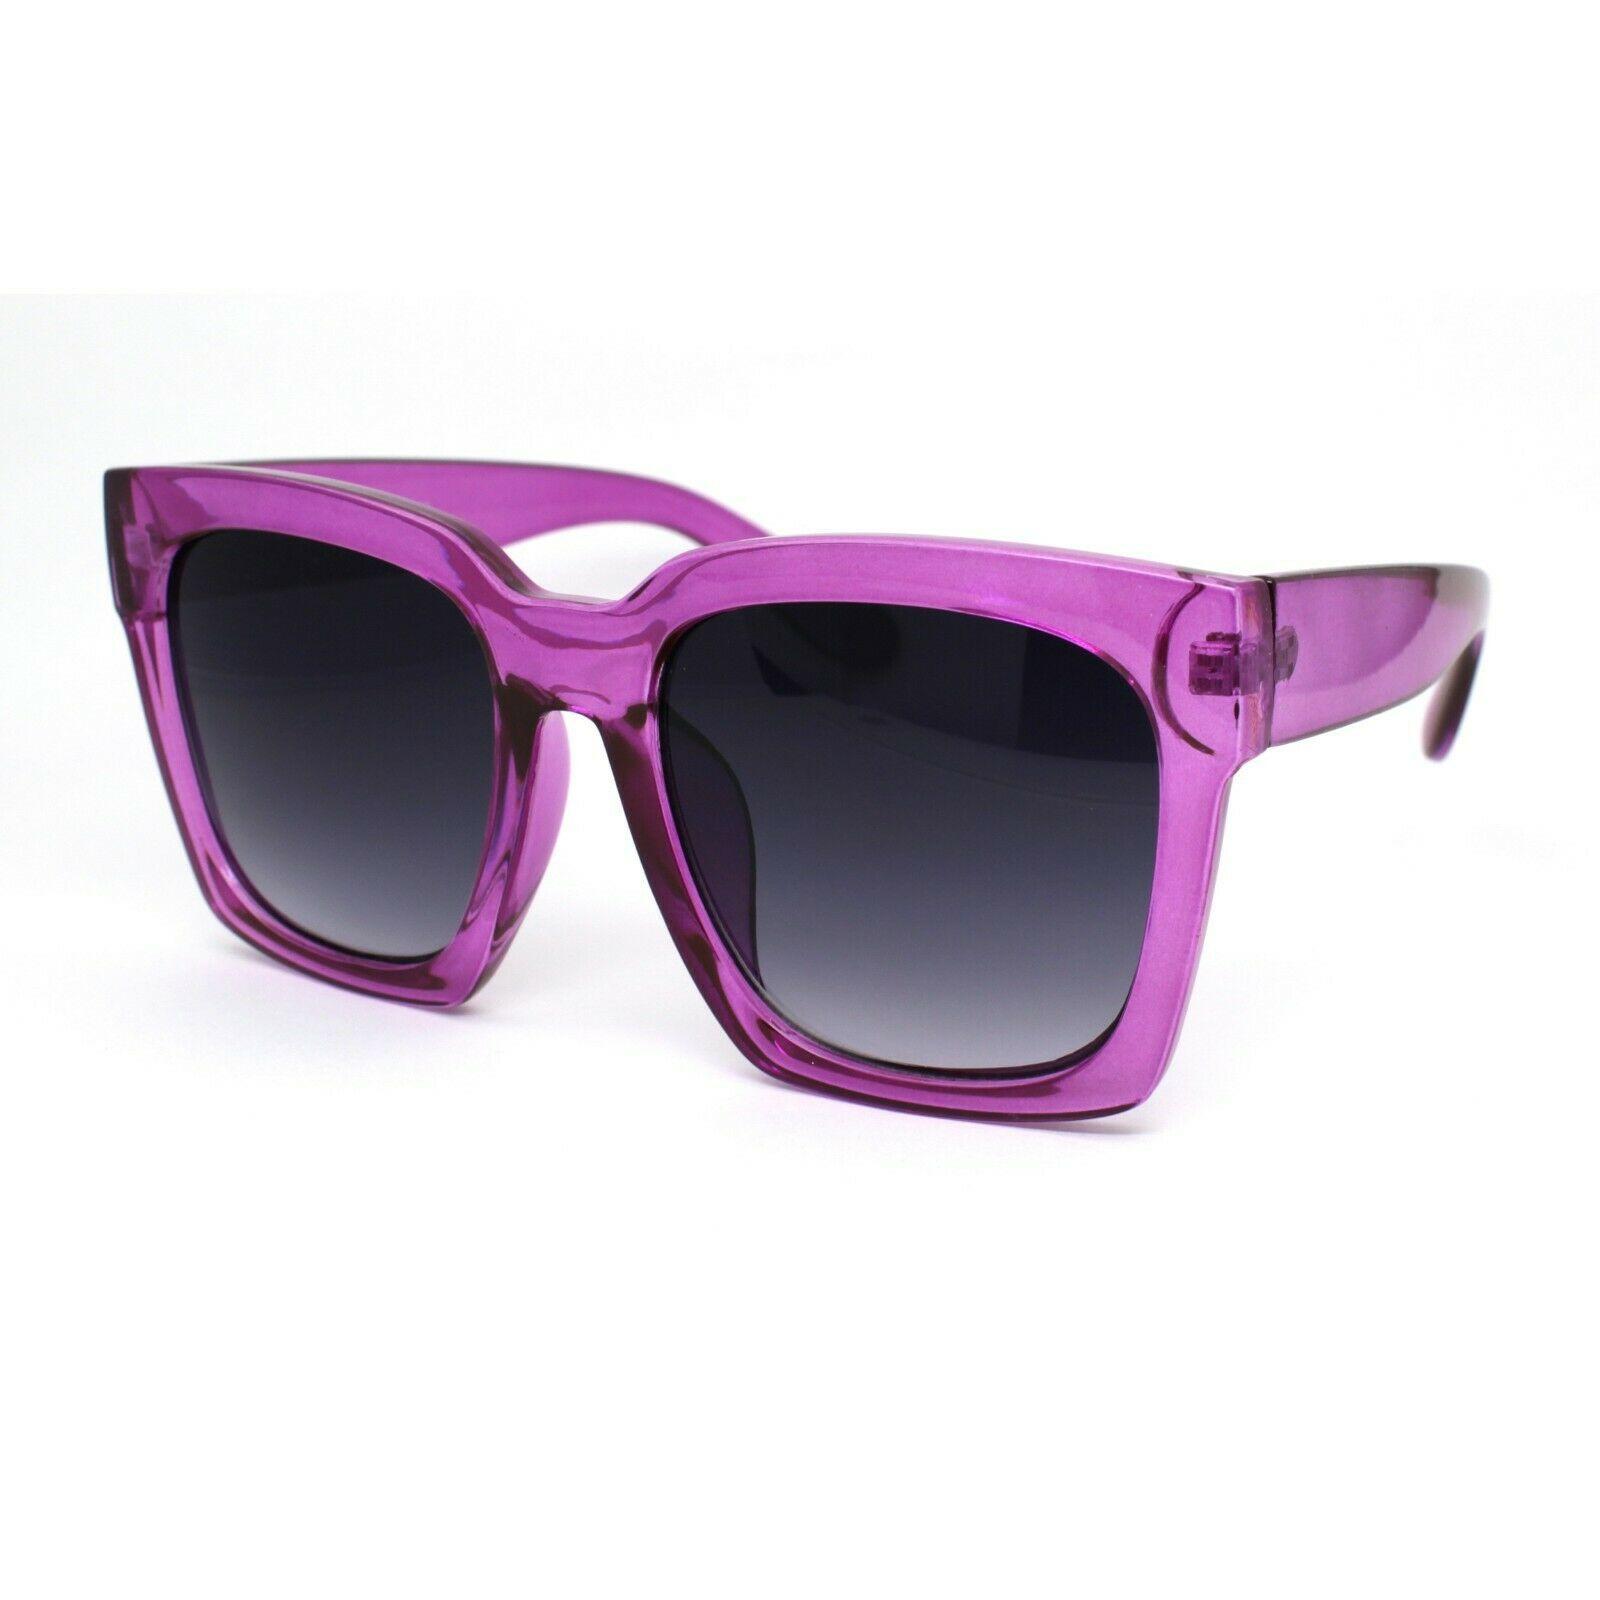 Womens XL Oversize Horned Rim Thick Plastic Retro Sunglasses